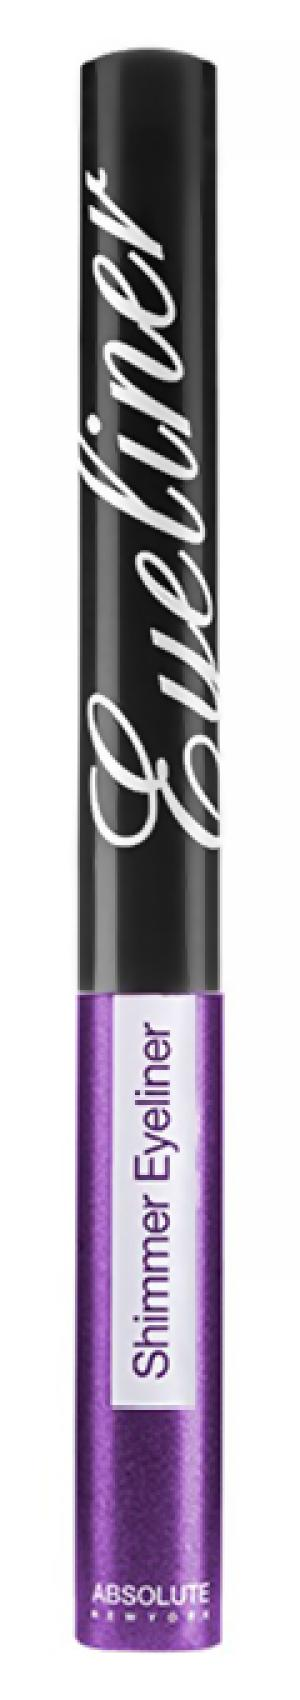 Подводка Absolute New York NF006 Purple. Цвет: nf006 purple